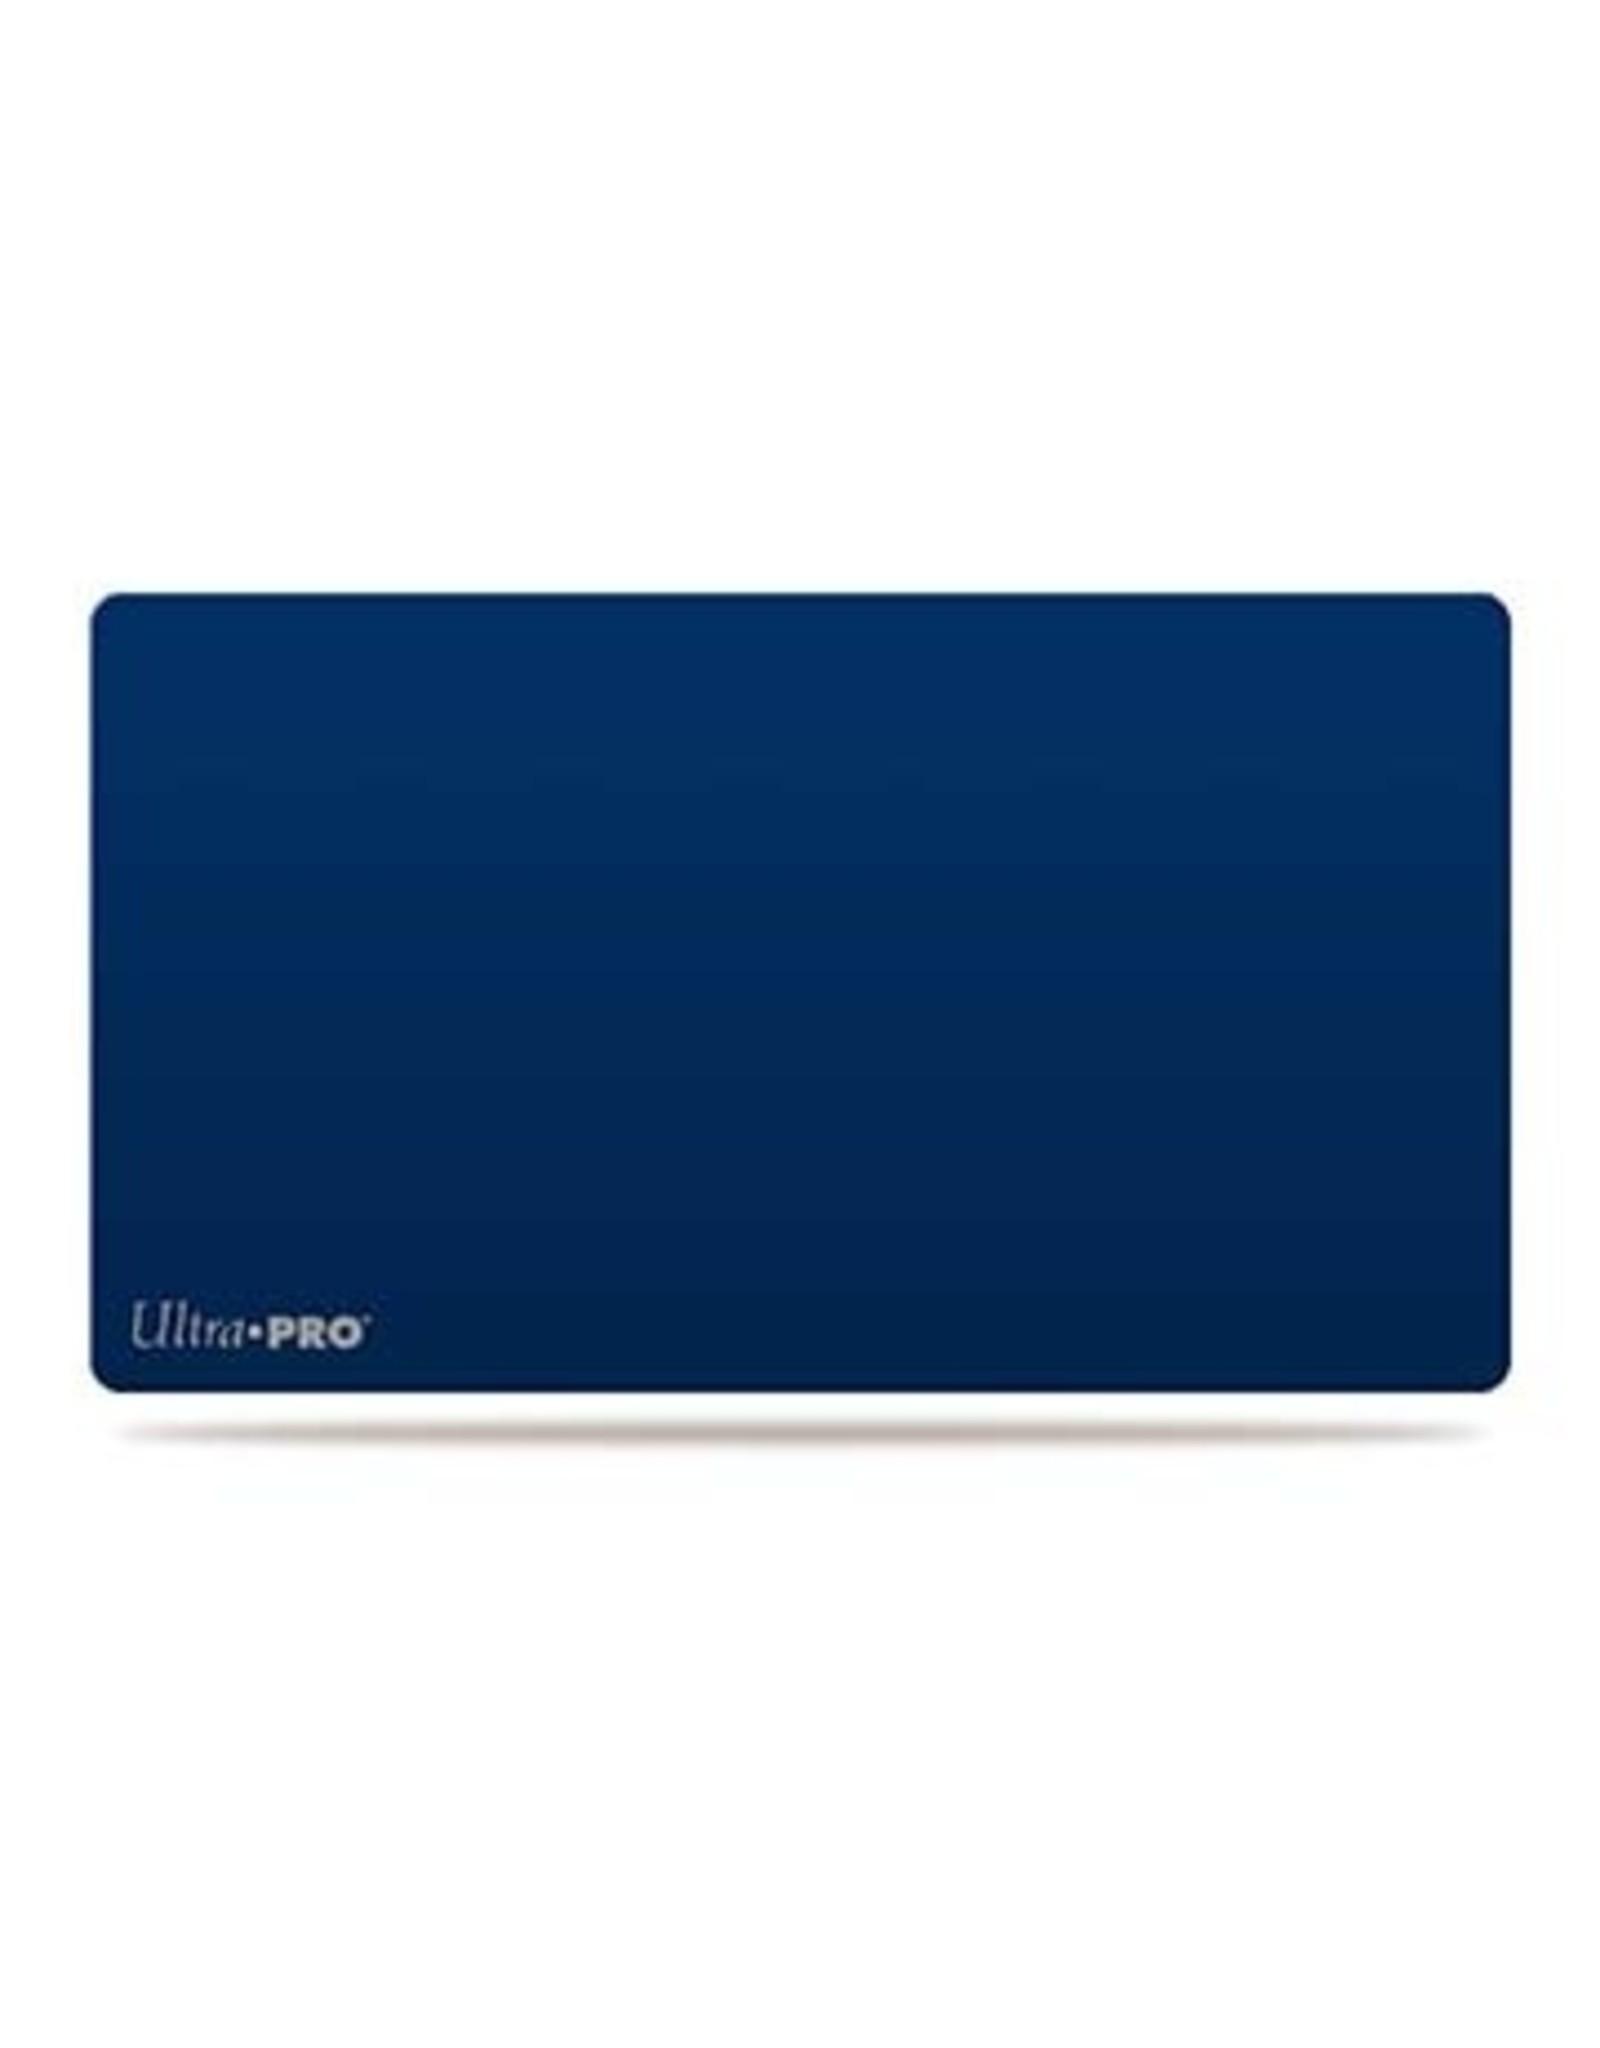 Ultra Pro Ultra Pro Playmat Artist: Solid Blue